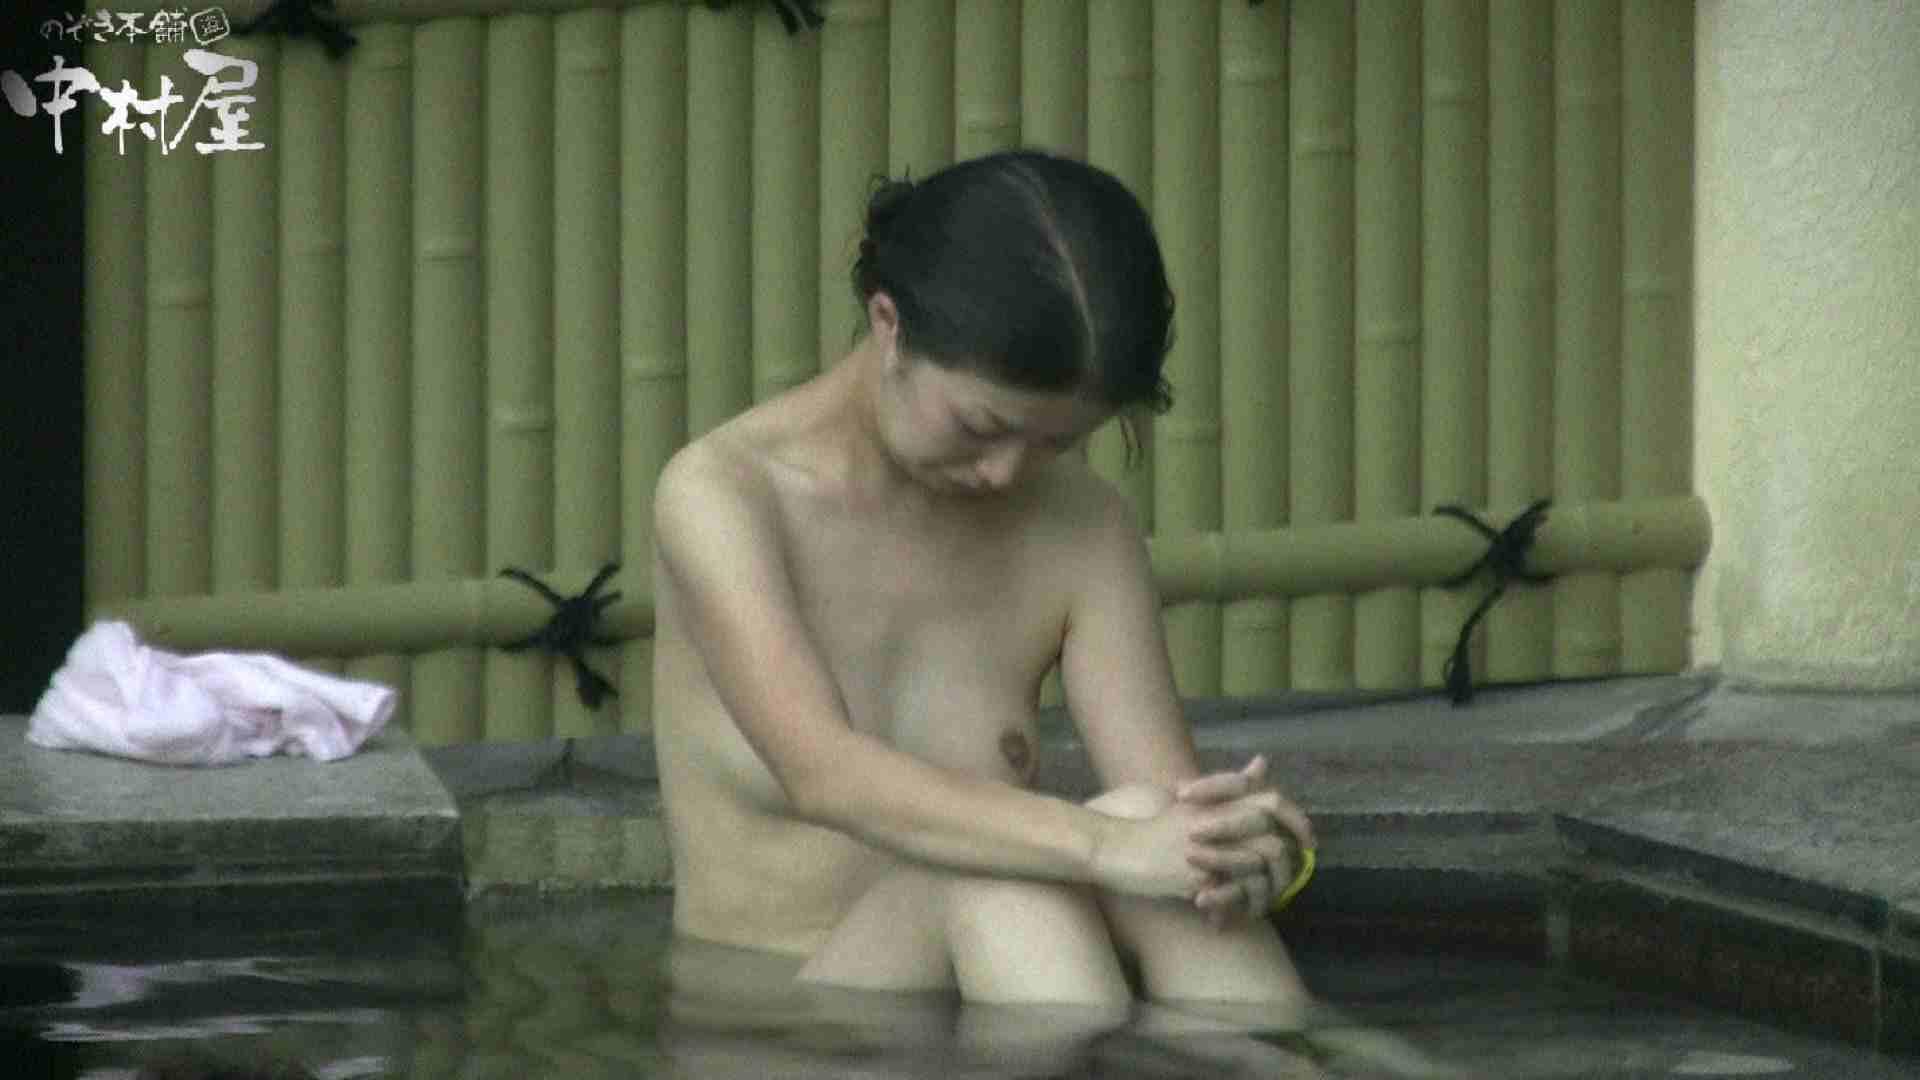 Aquaな露天風呂Vol.904 露天  85連発 66